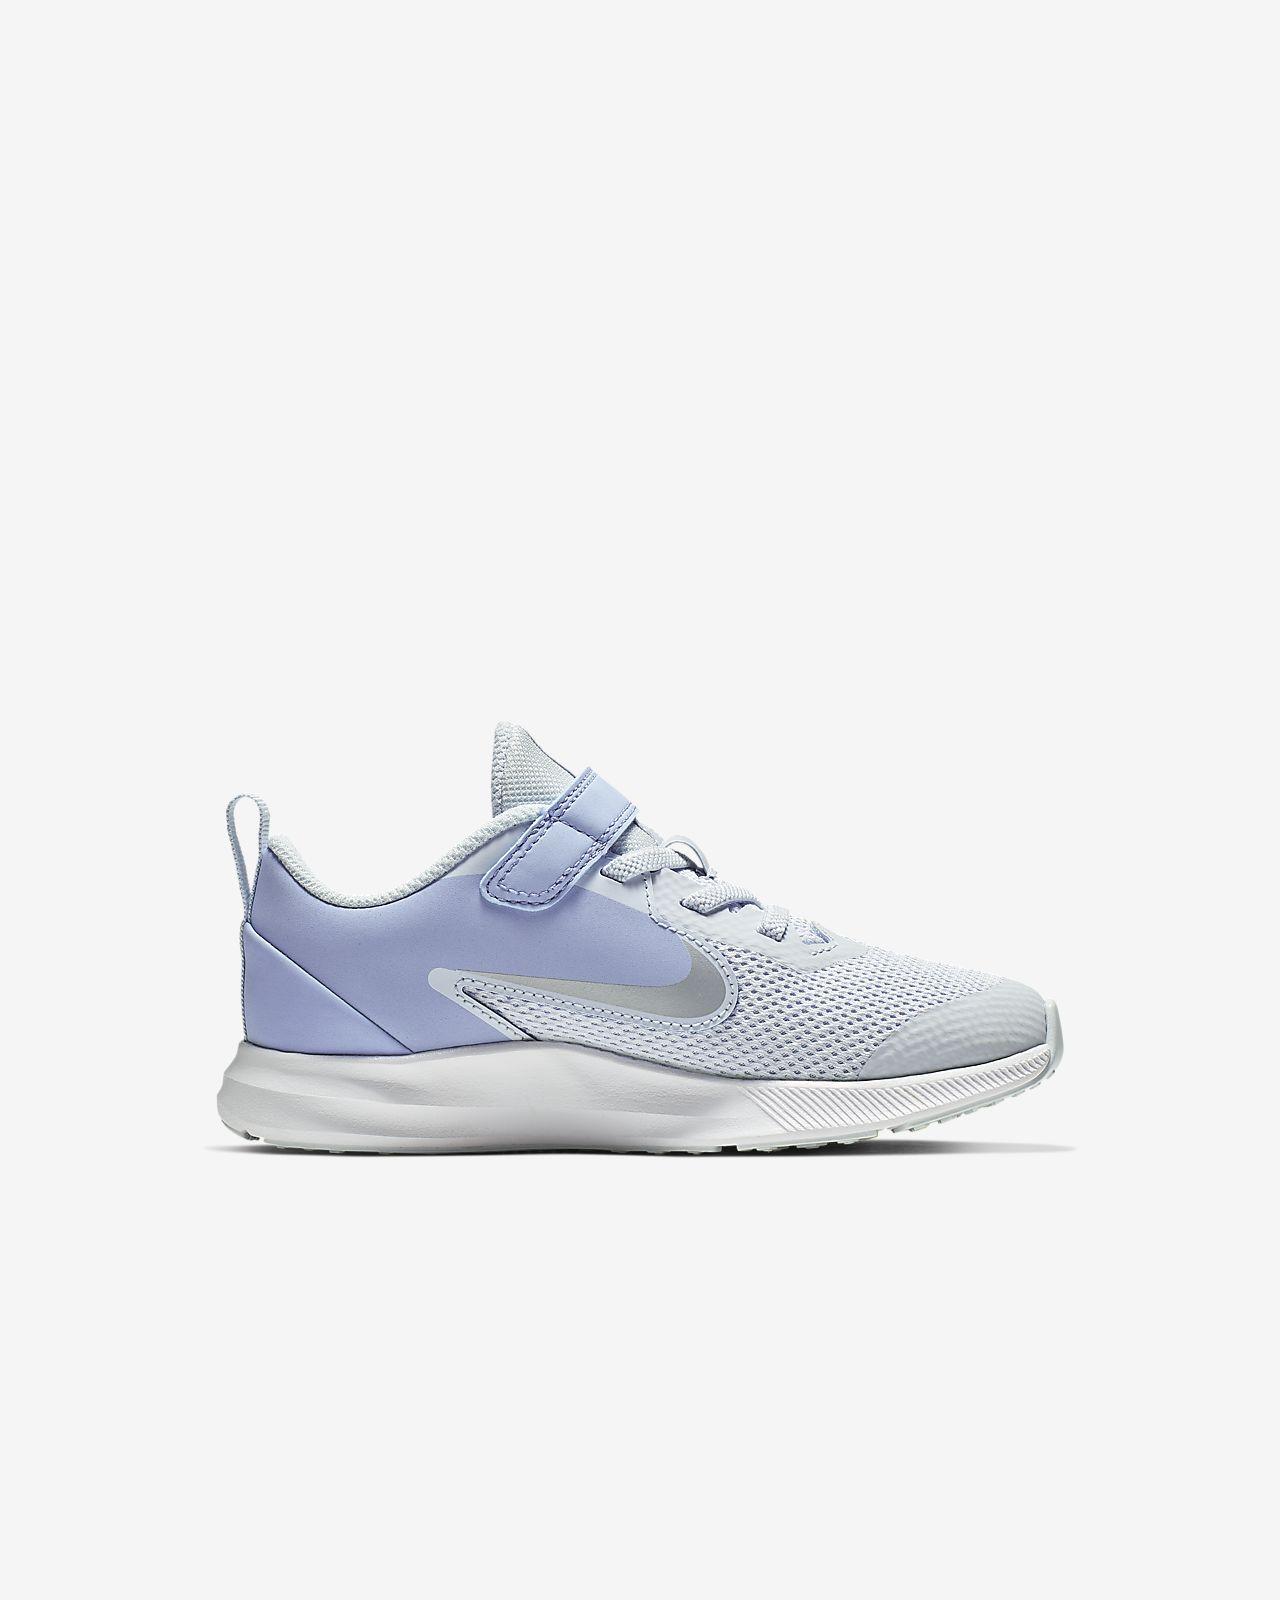 d173ab9dce72 Nike Downshifter 9 Little Kids  Shoe. Nike.com